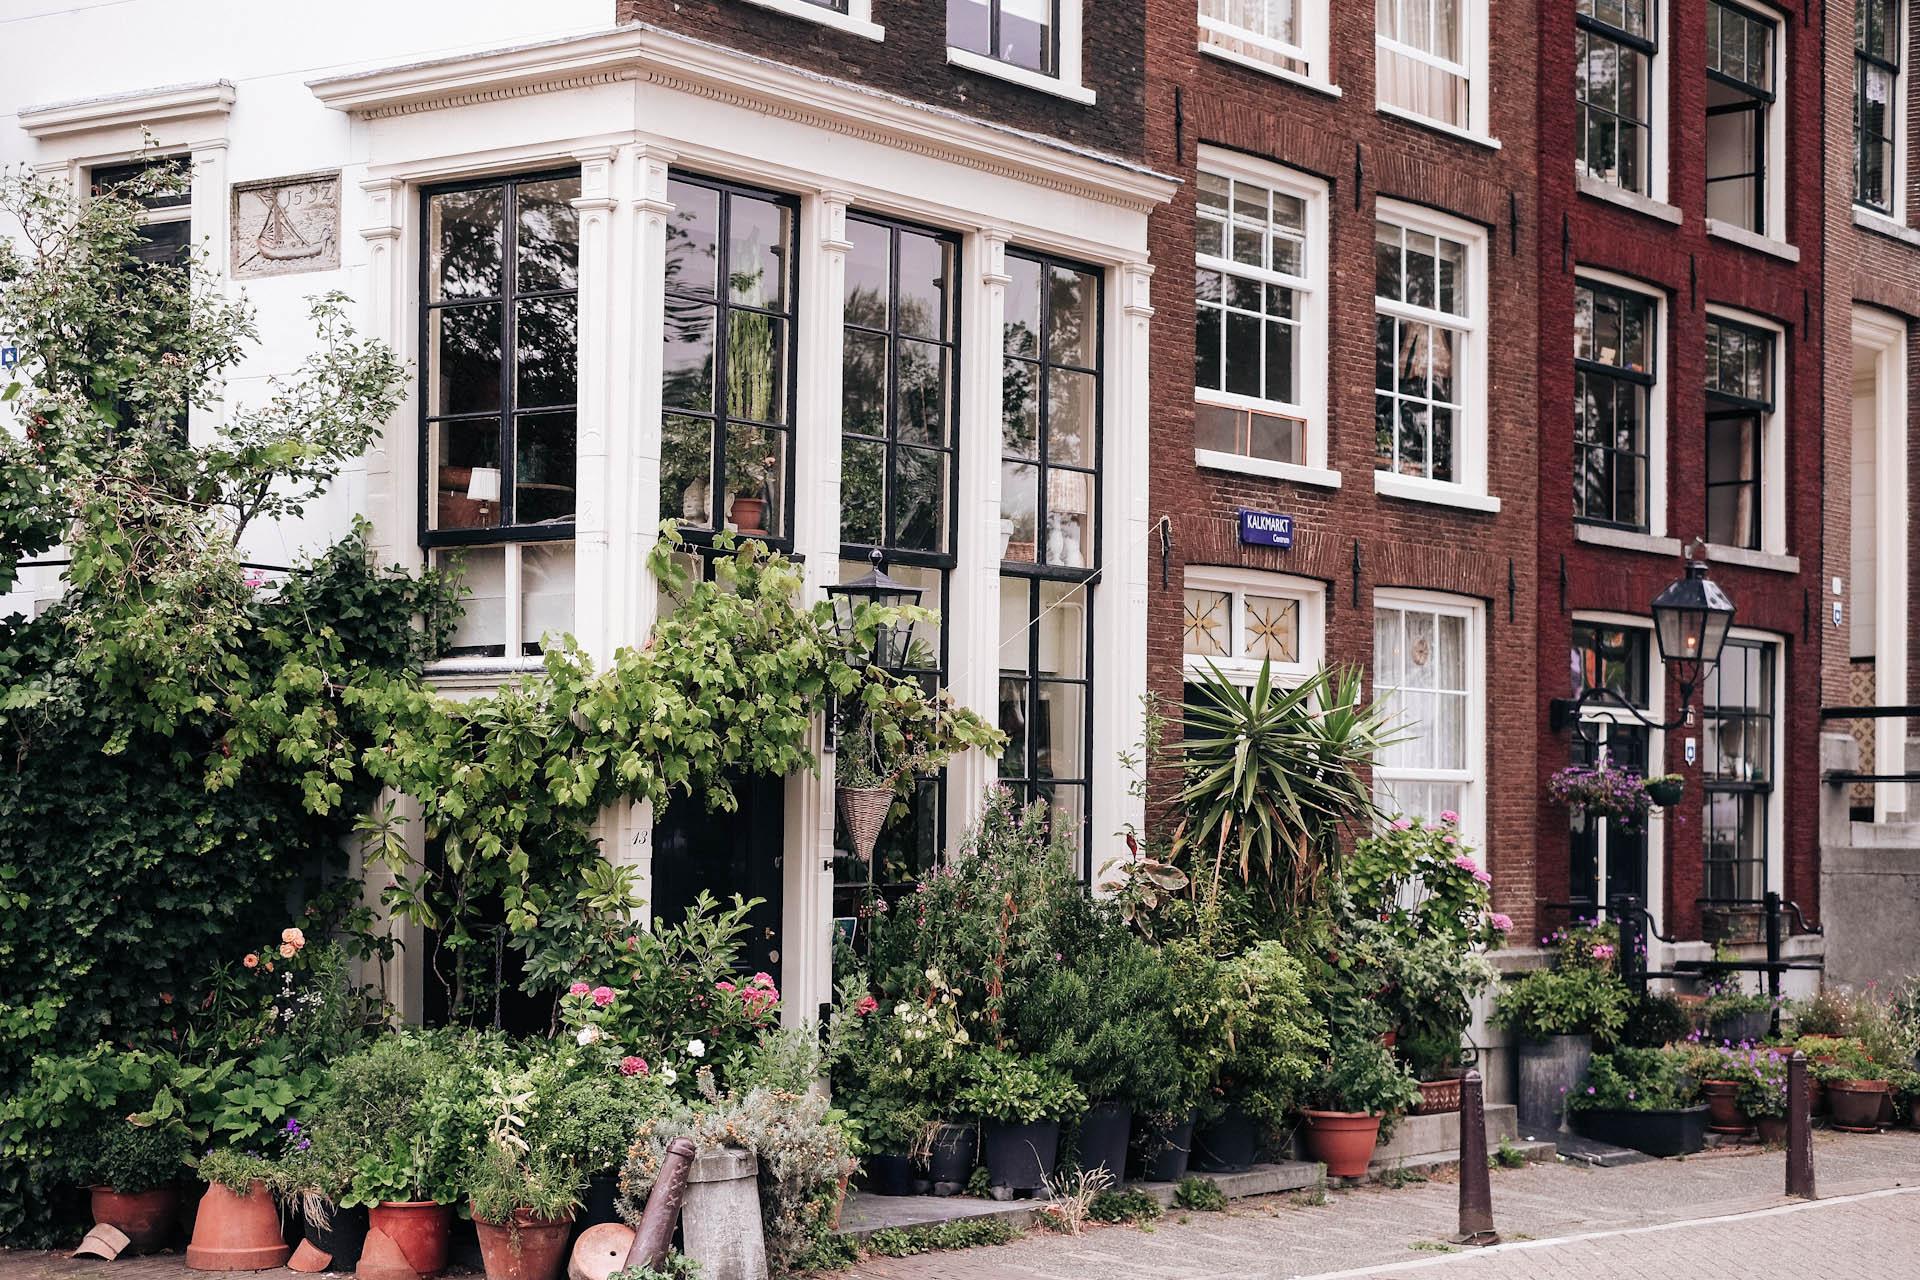 Amsterdam, In Bloom